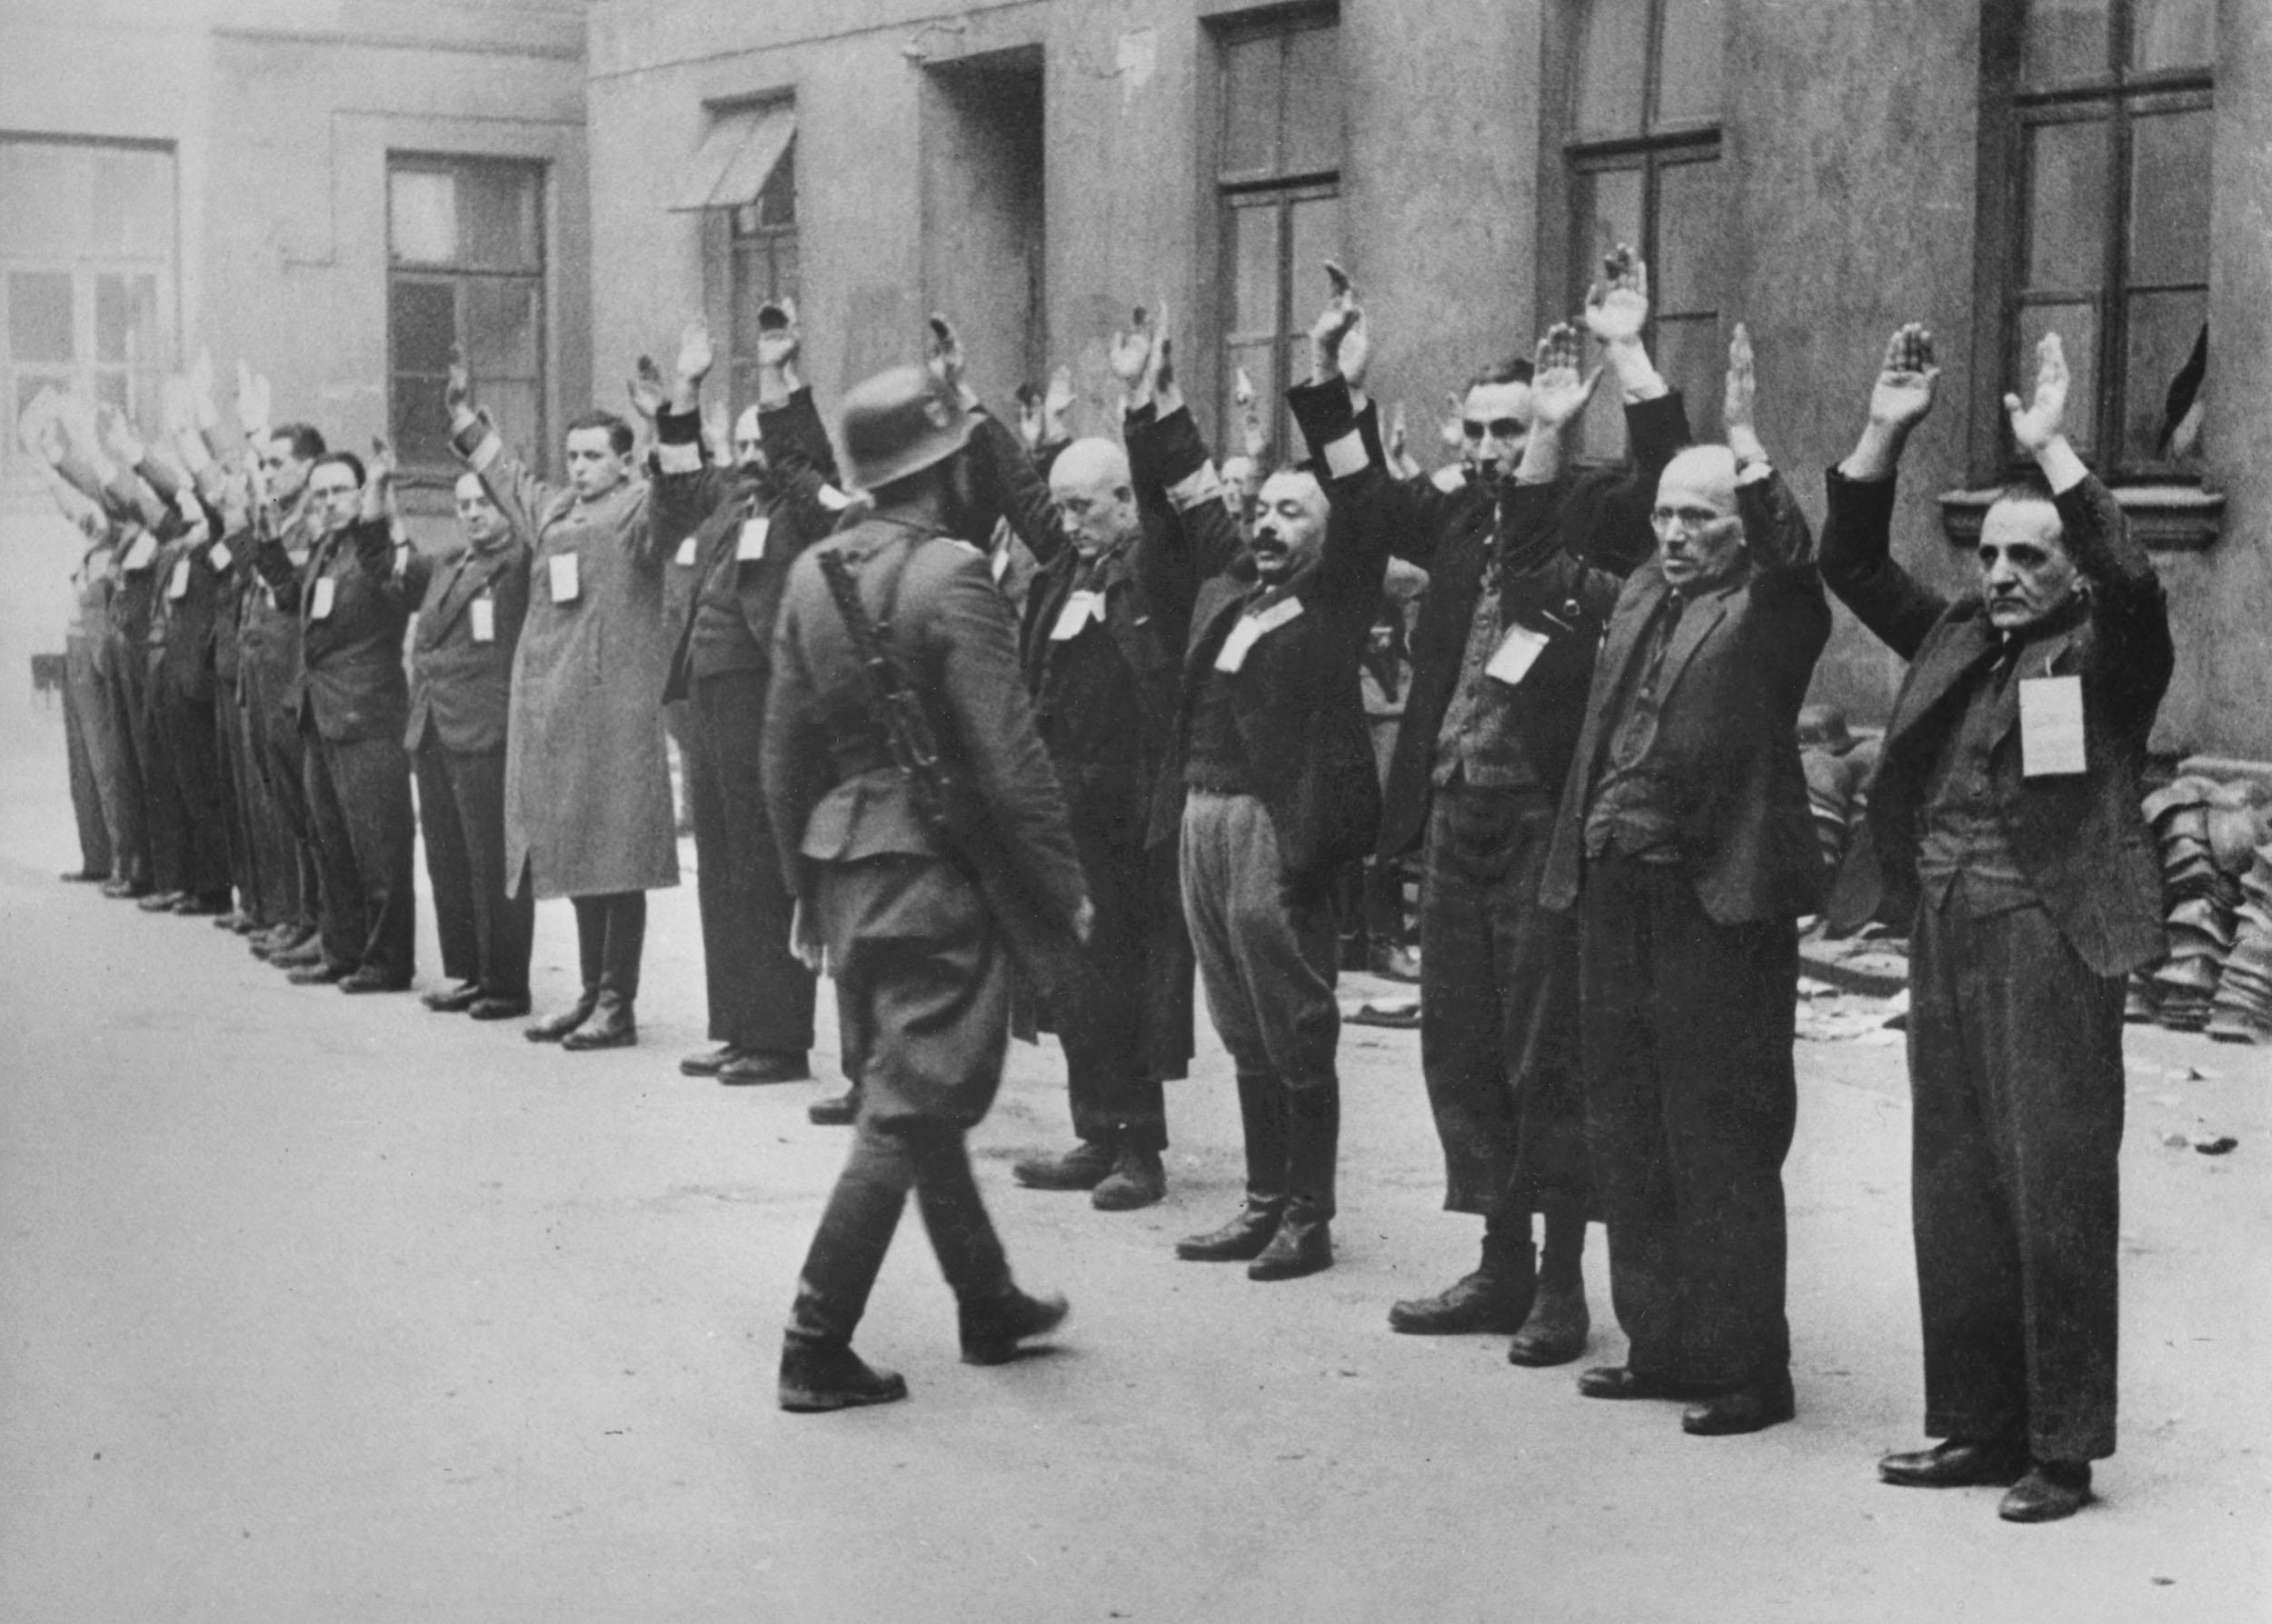 70 Years Later, Police Arrest Alleged Nazi in Philadelphia